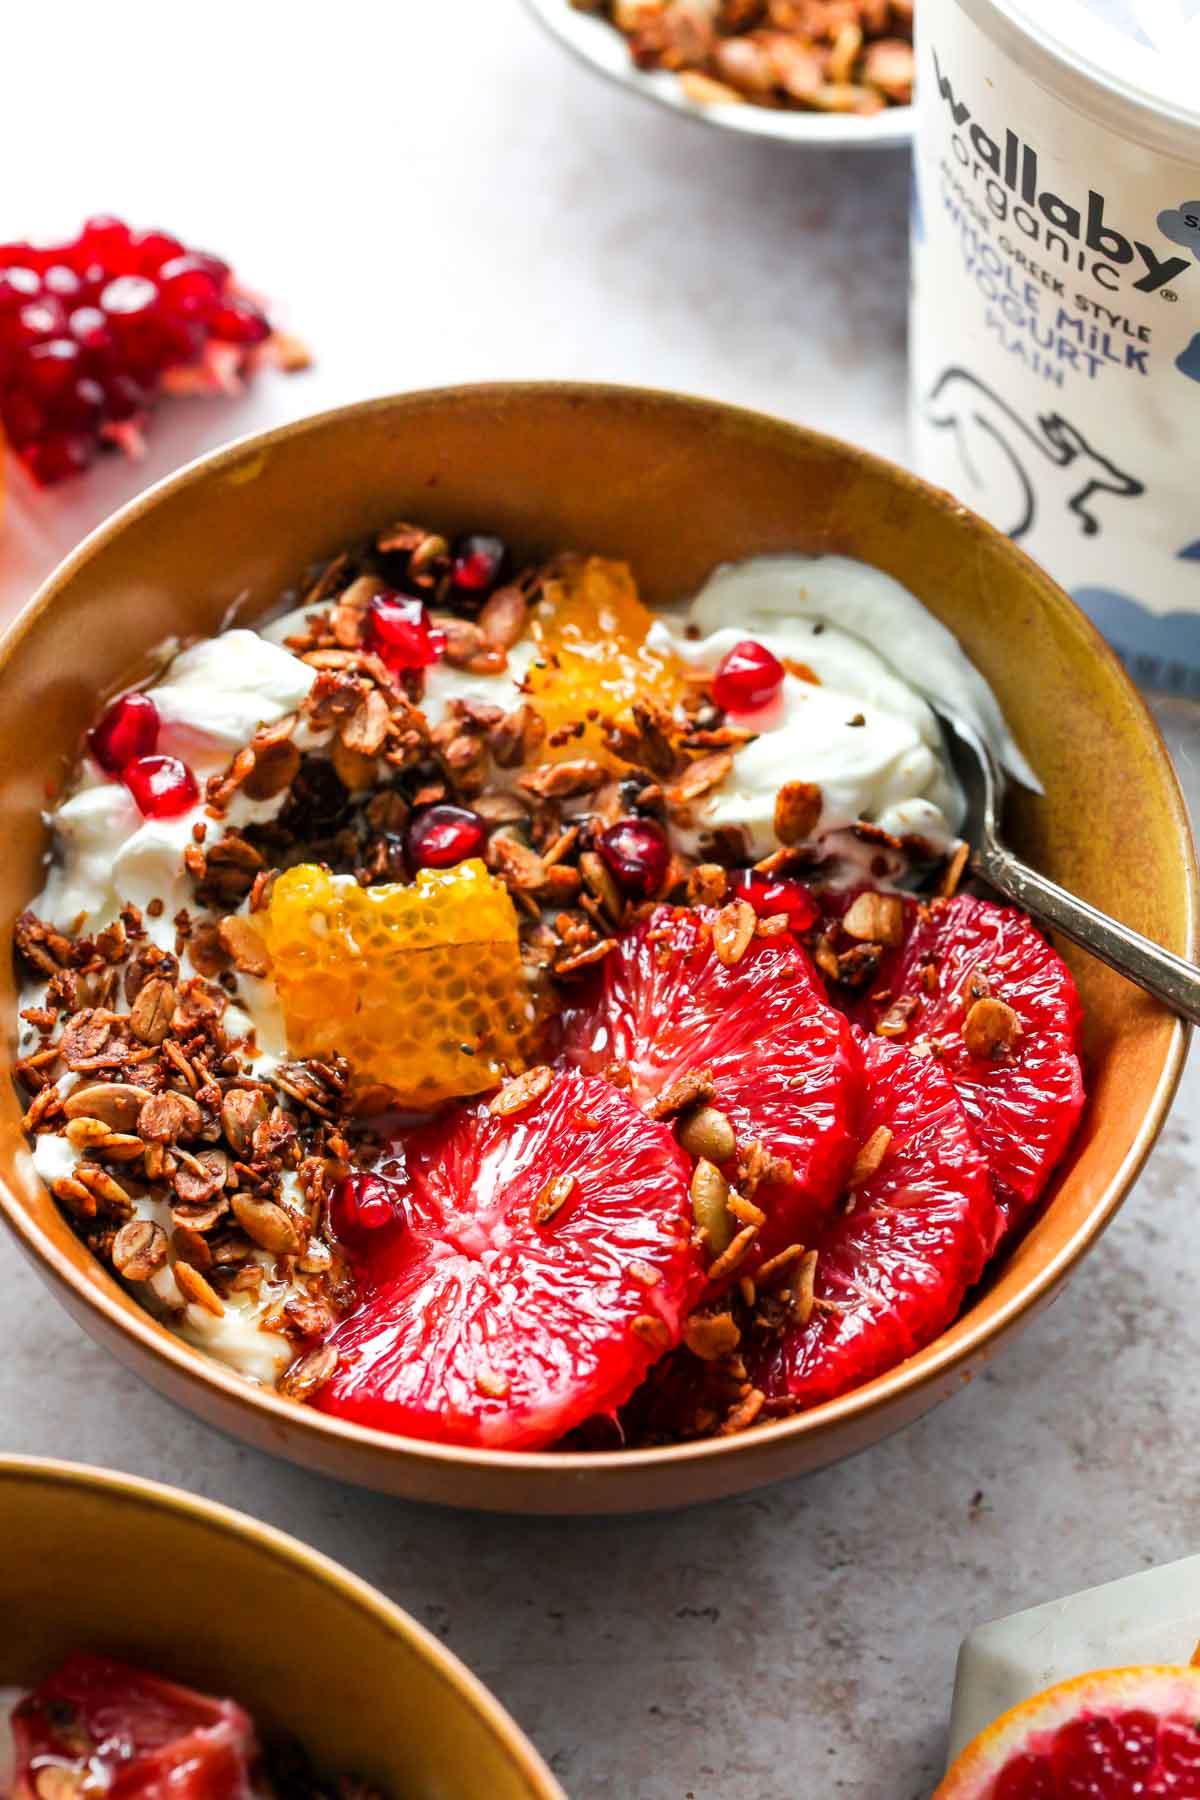 Protein granola served over yogurt with orange slices